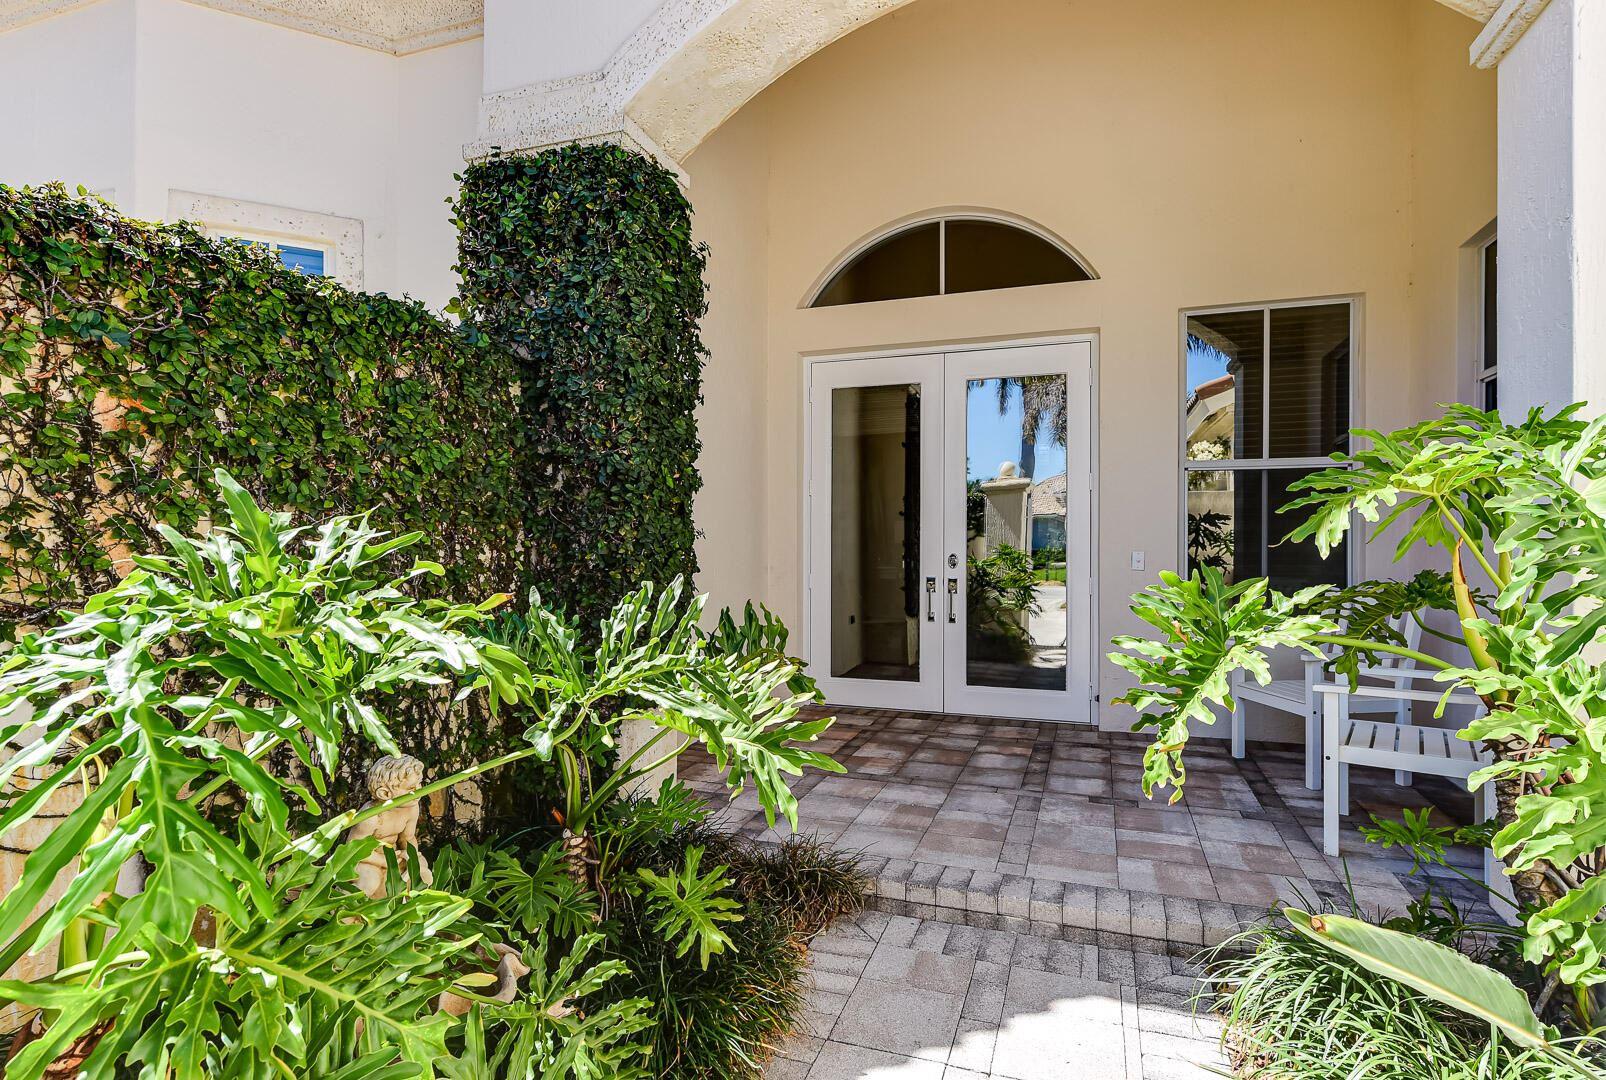 Photo of 7713 Preserve Drive, West Palm Beach, FL 33412 (MLS # RX-10726452)